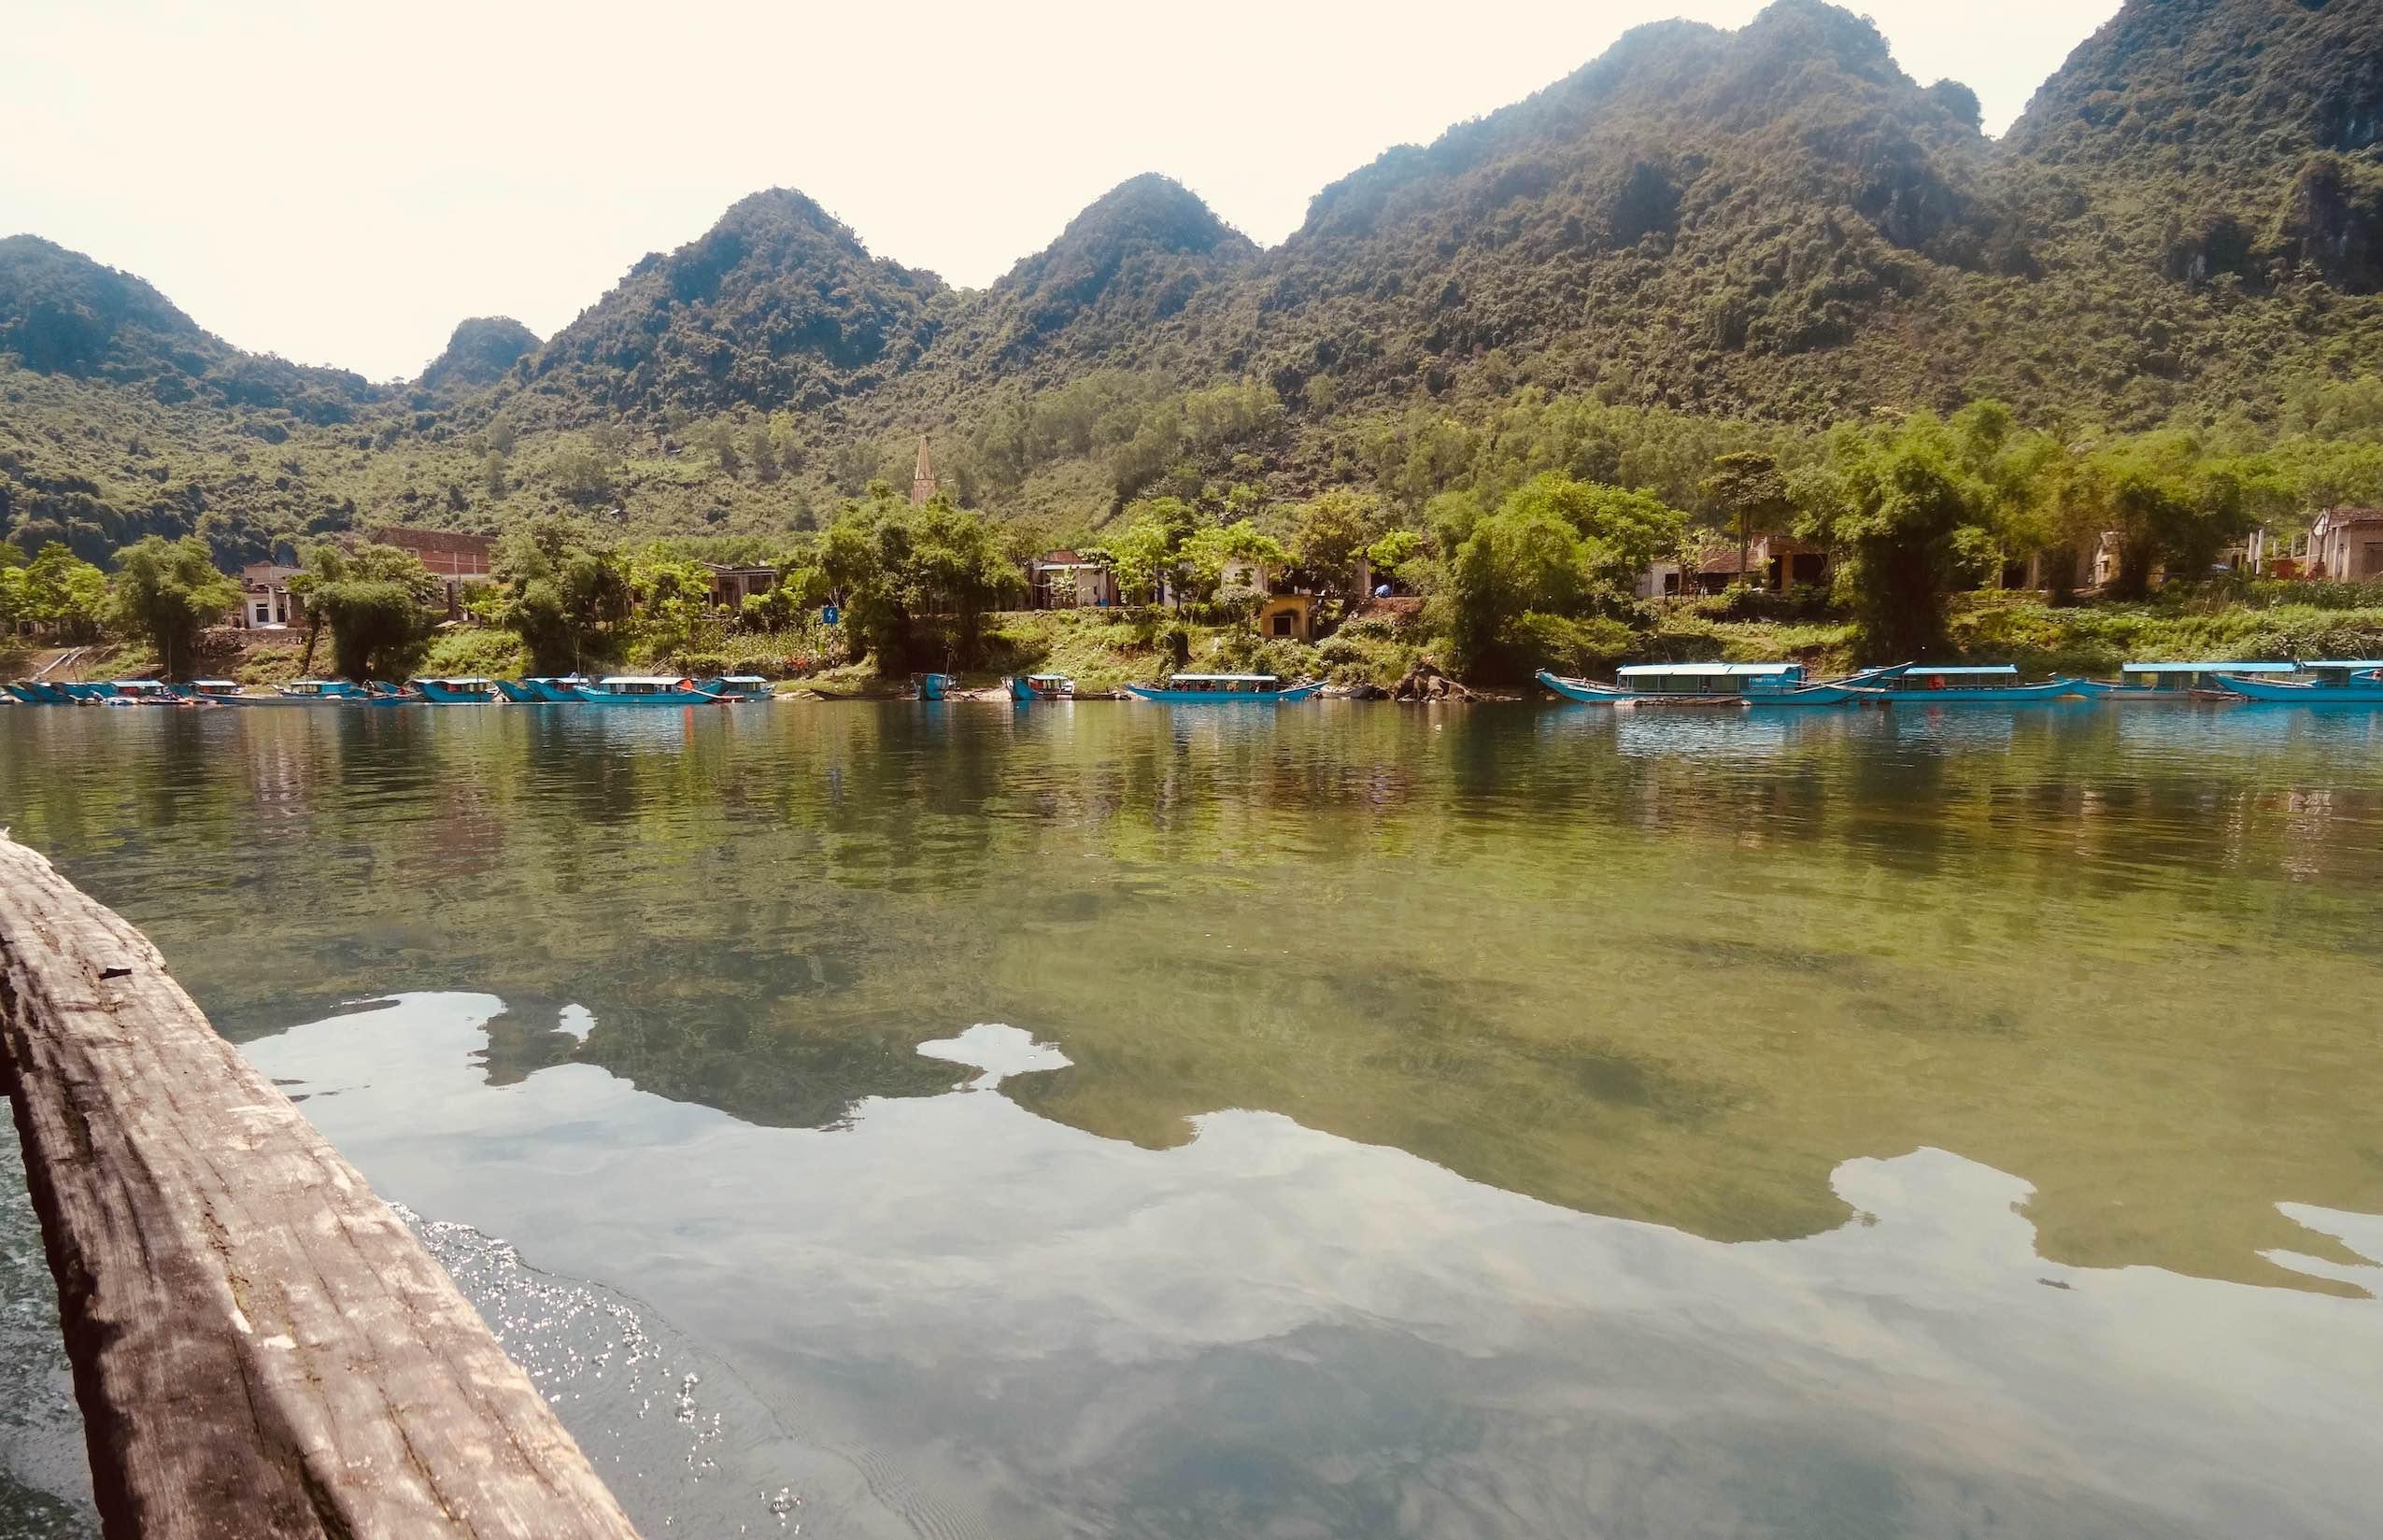 Son River cruise in Vietnam.